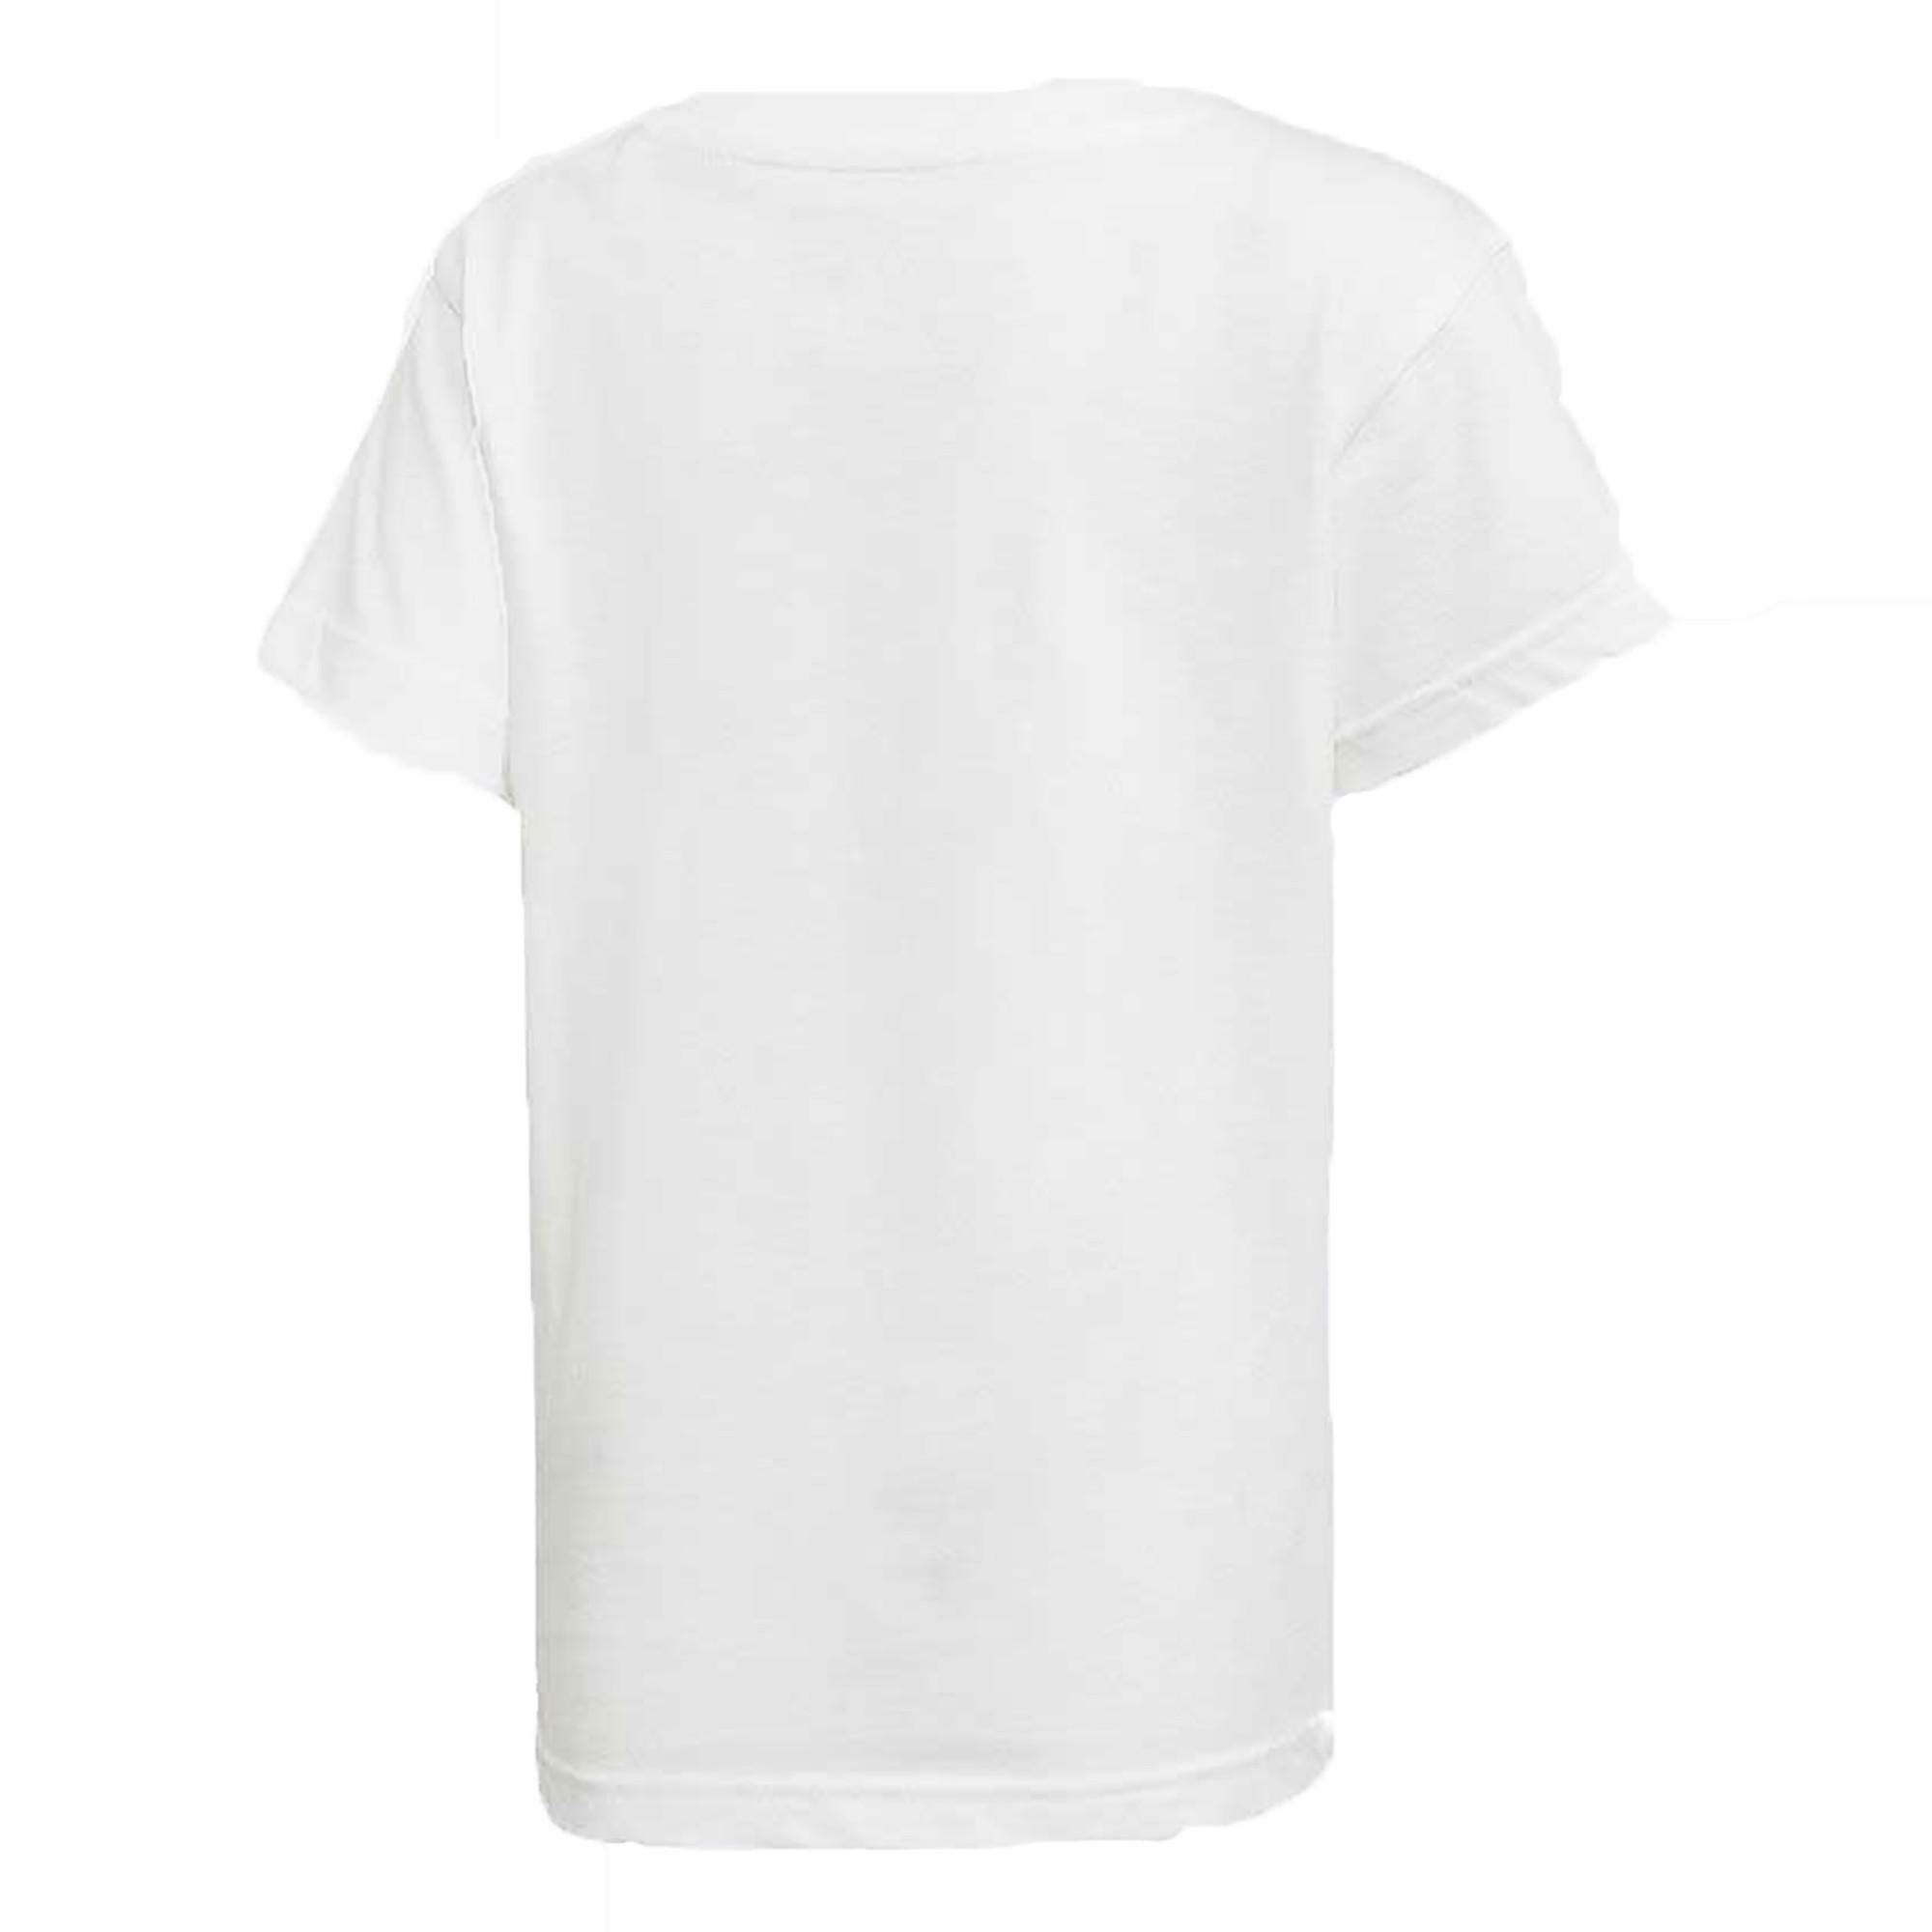 adidas adidas trefoil t-shirt bambino bianca dh2471